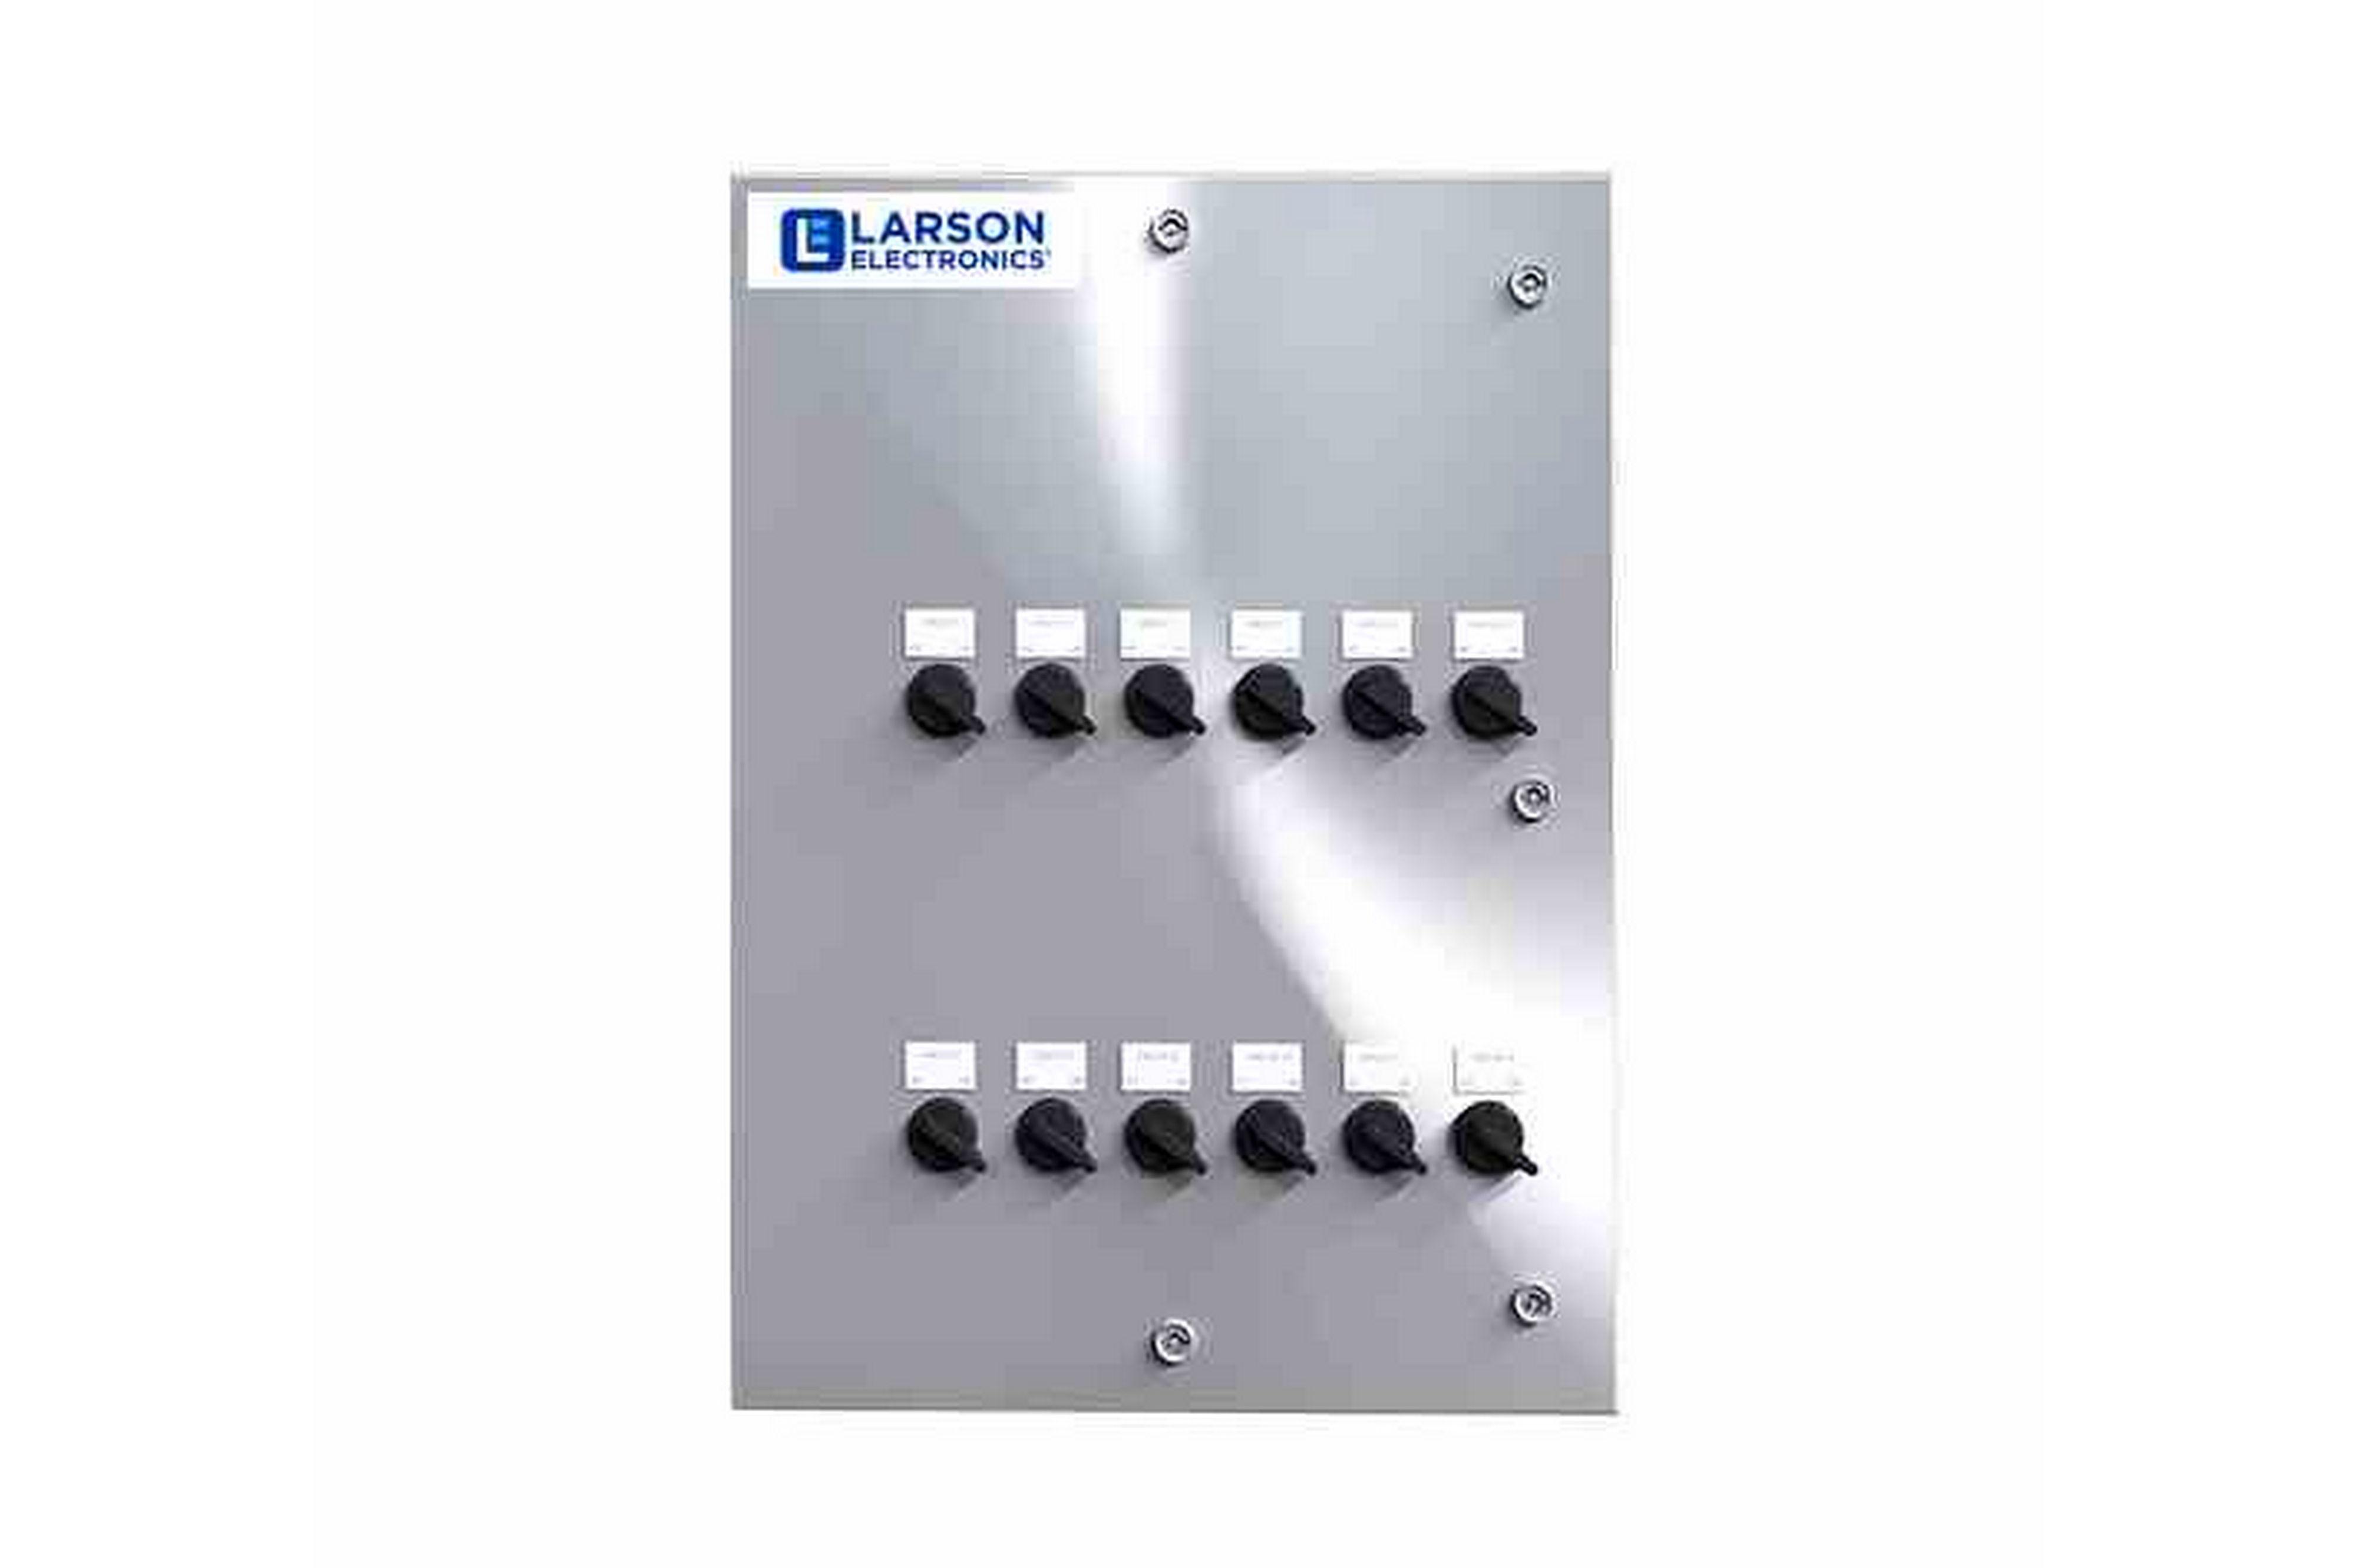 Larson Electronics C1d2 Explosion Proof Circuit Breaker